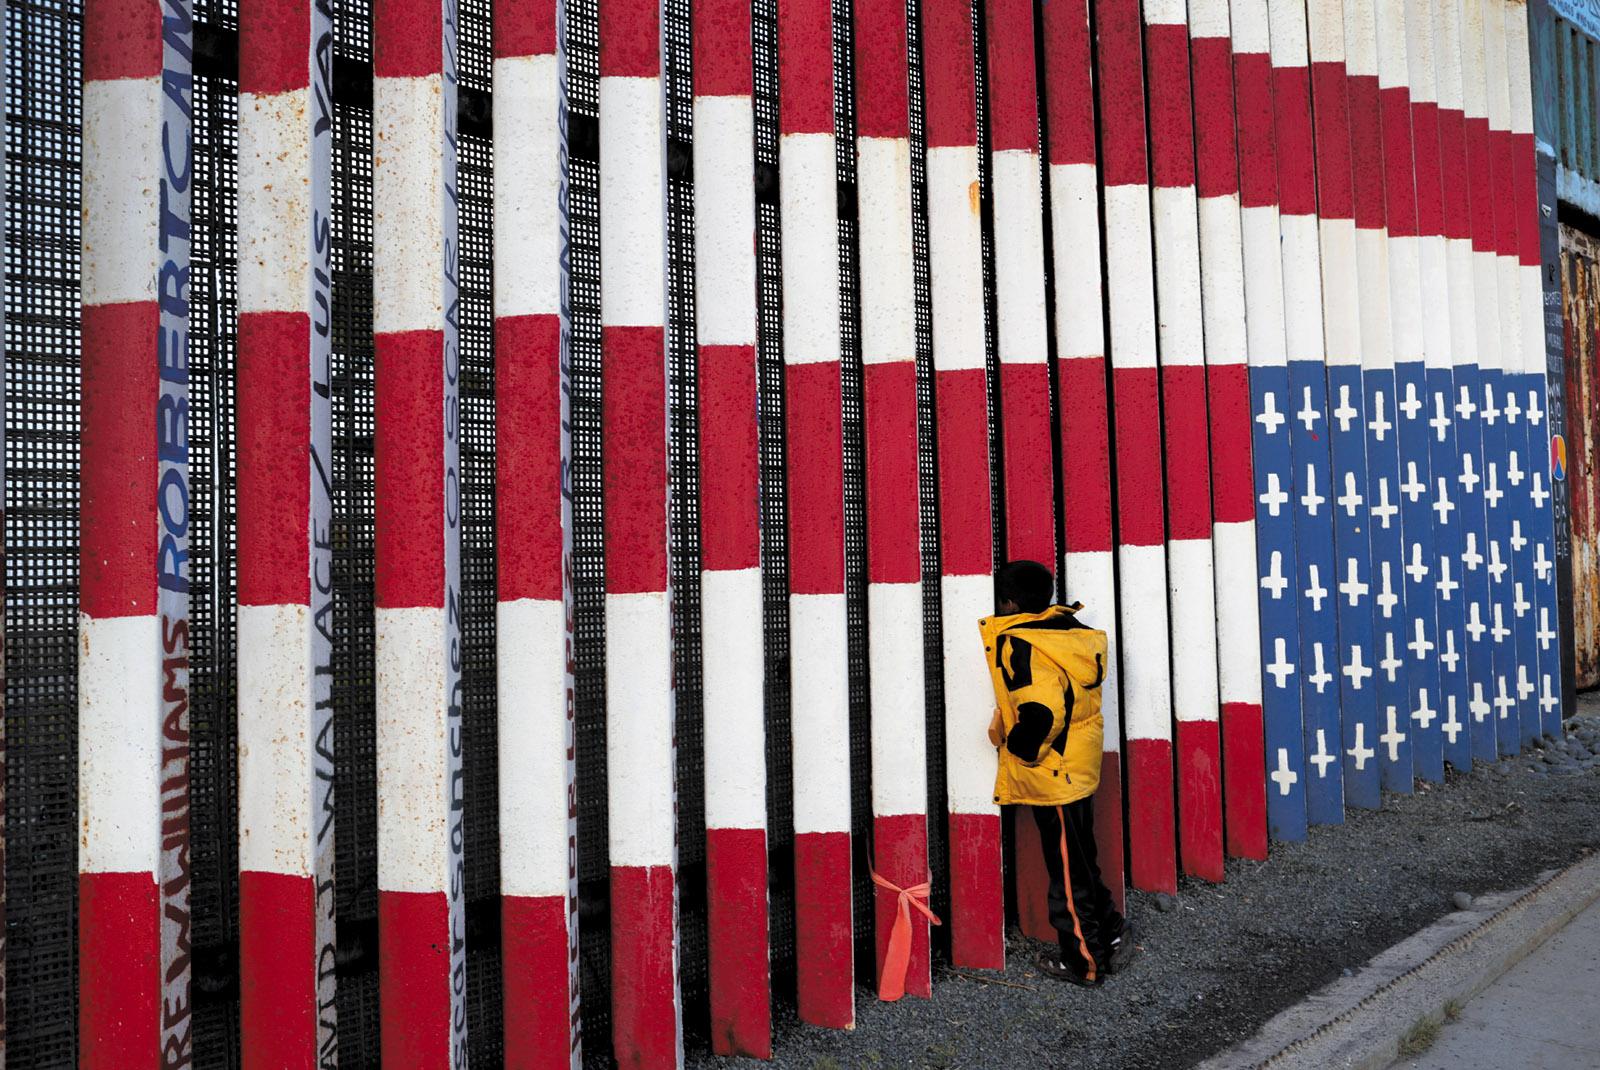 A migrant child looking through the US-Mexico border fence, Tijuana, November 2018